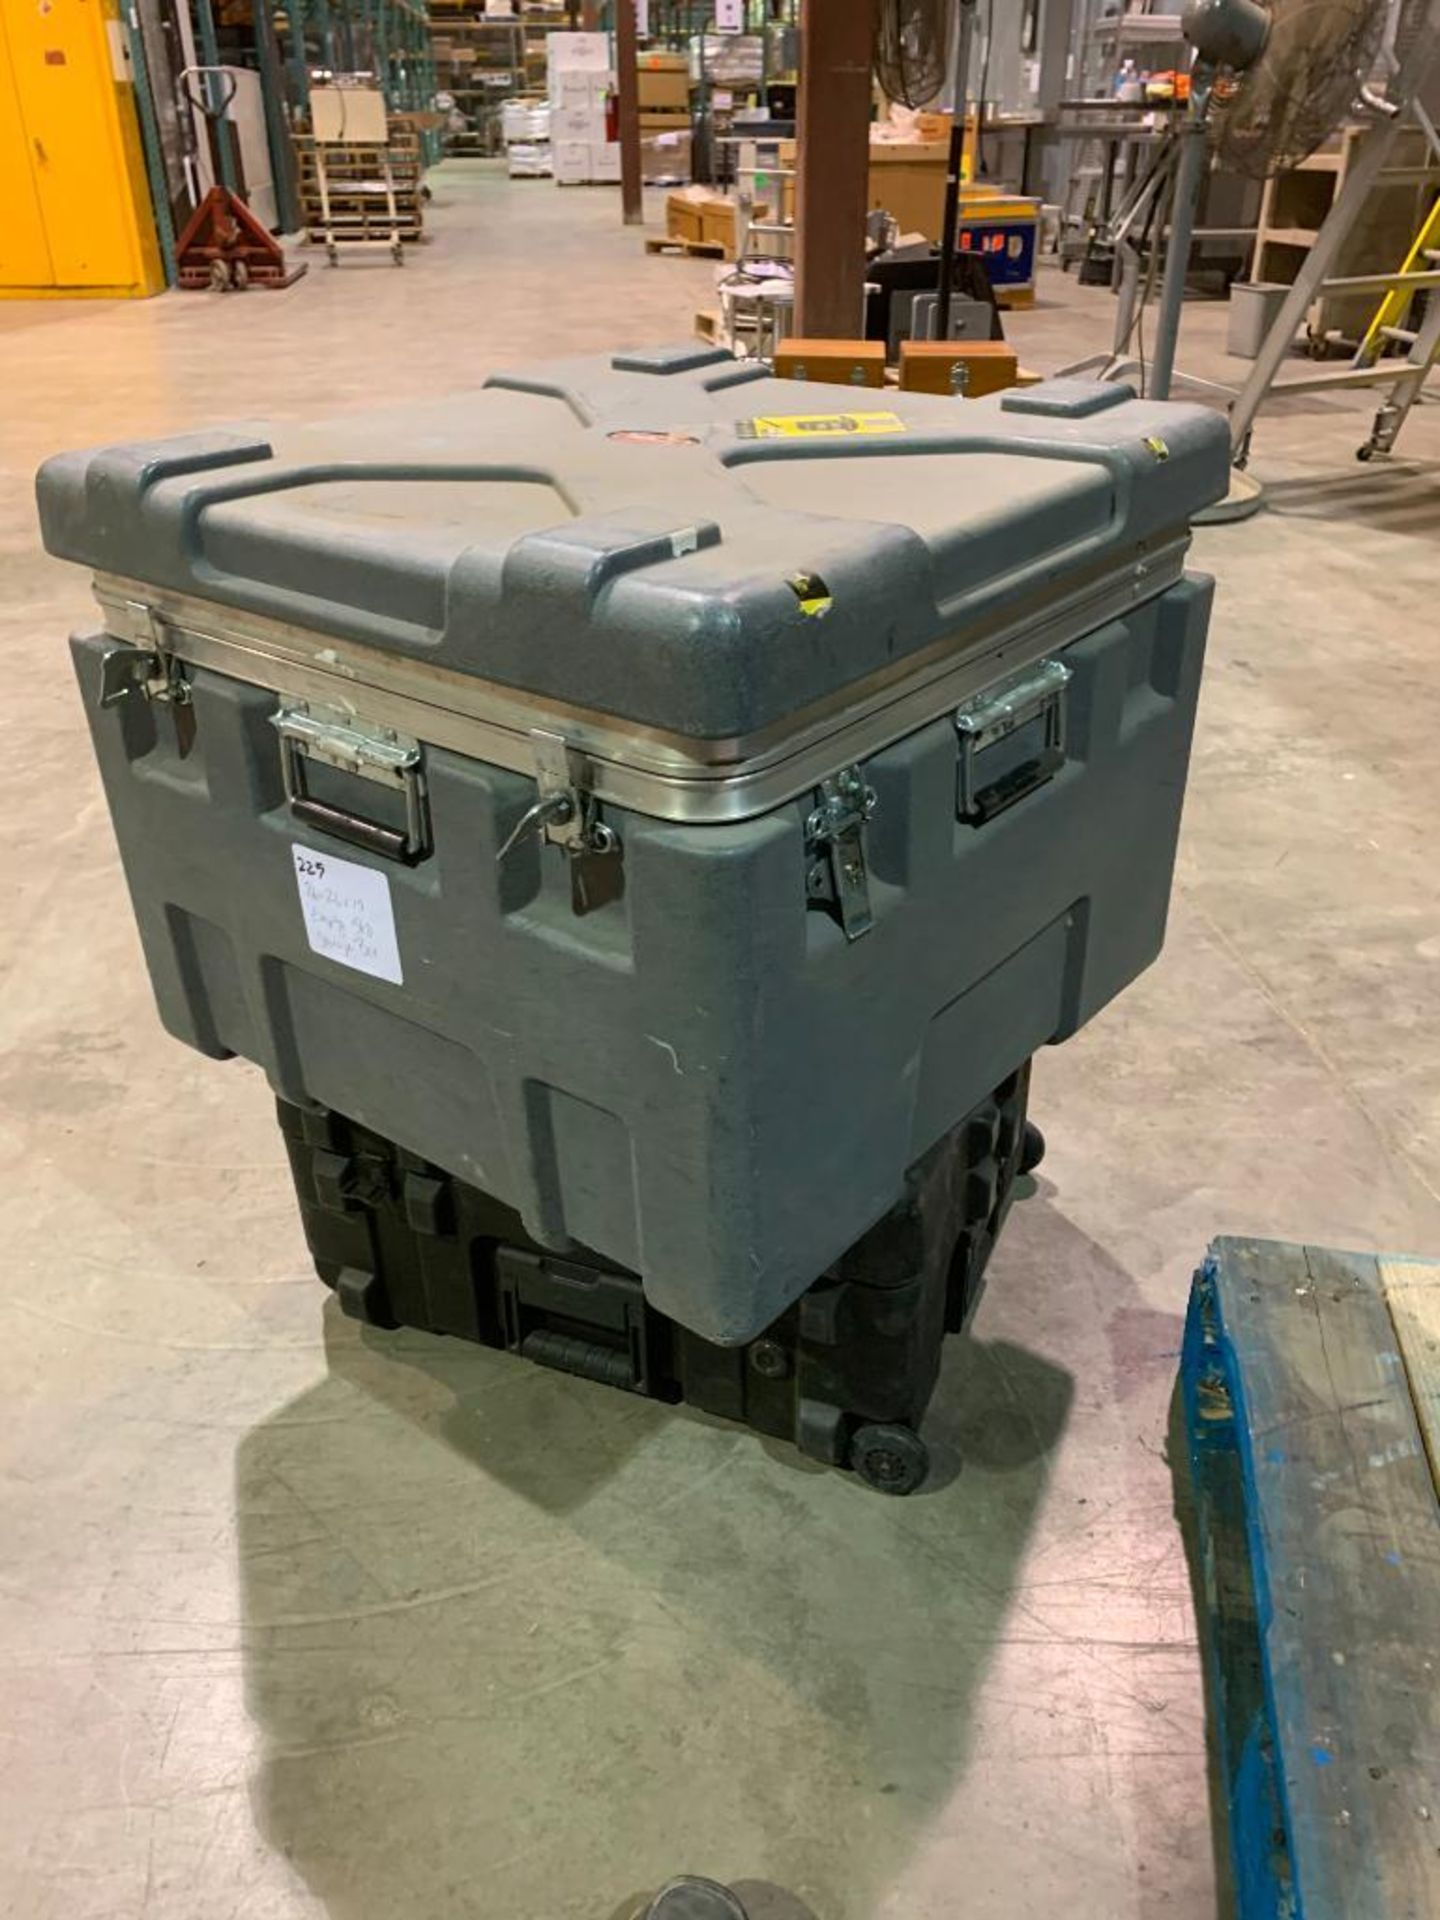 portable shipping box - Image 2 of 2